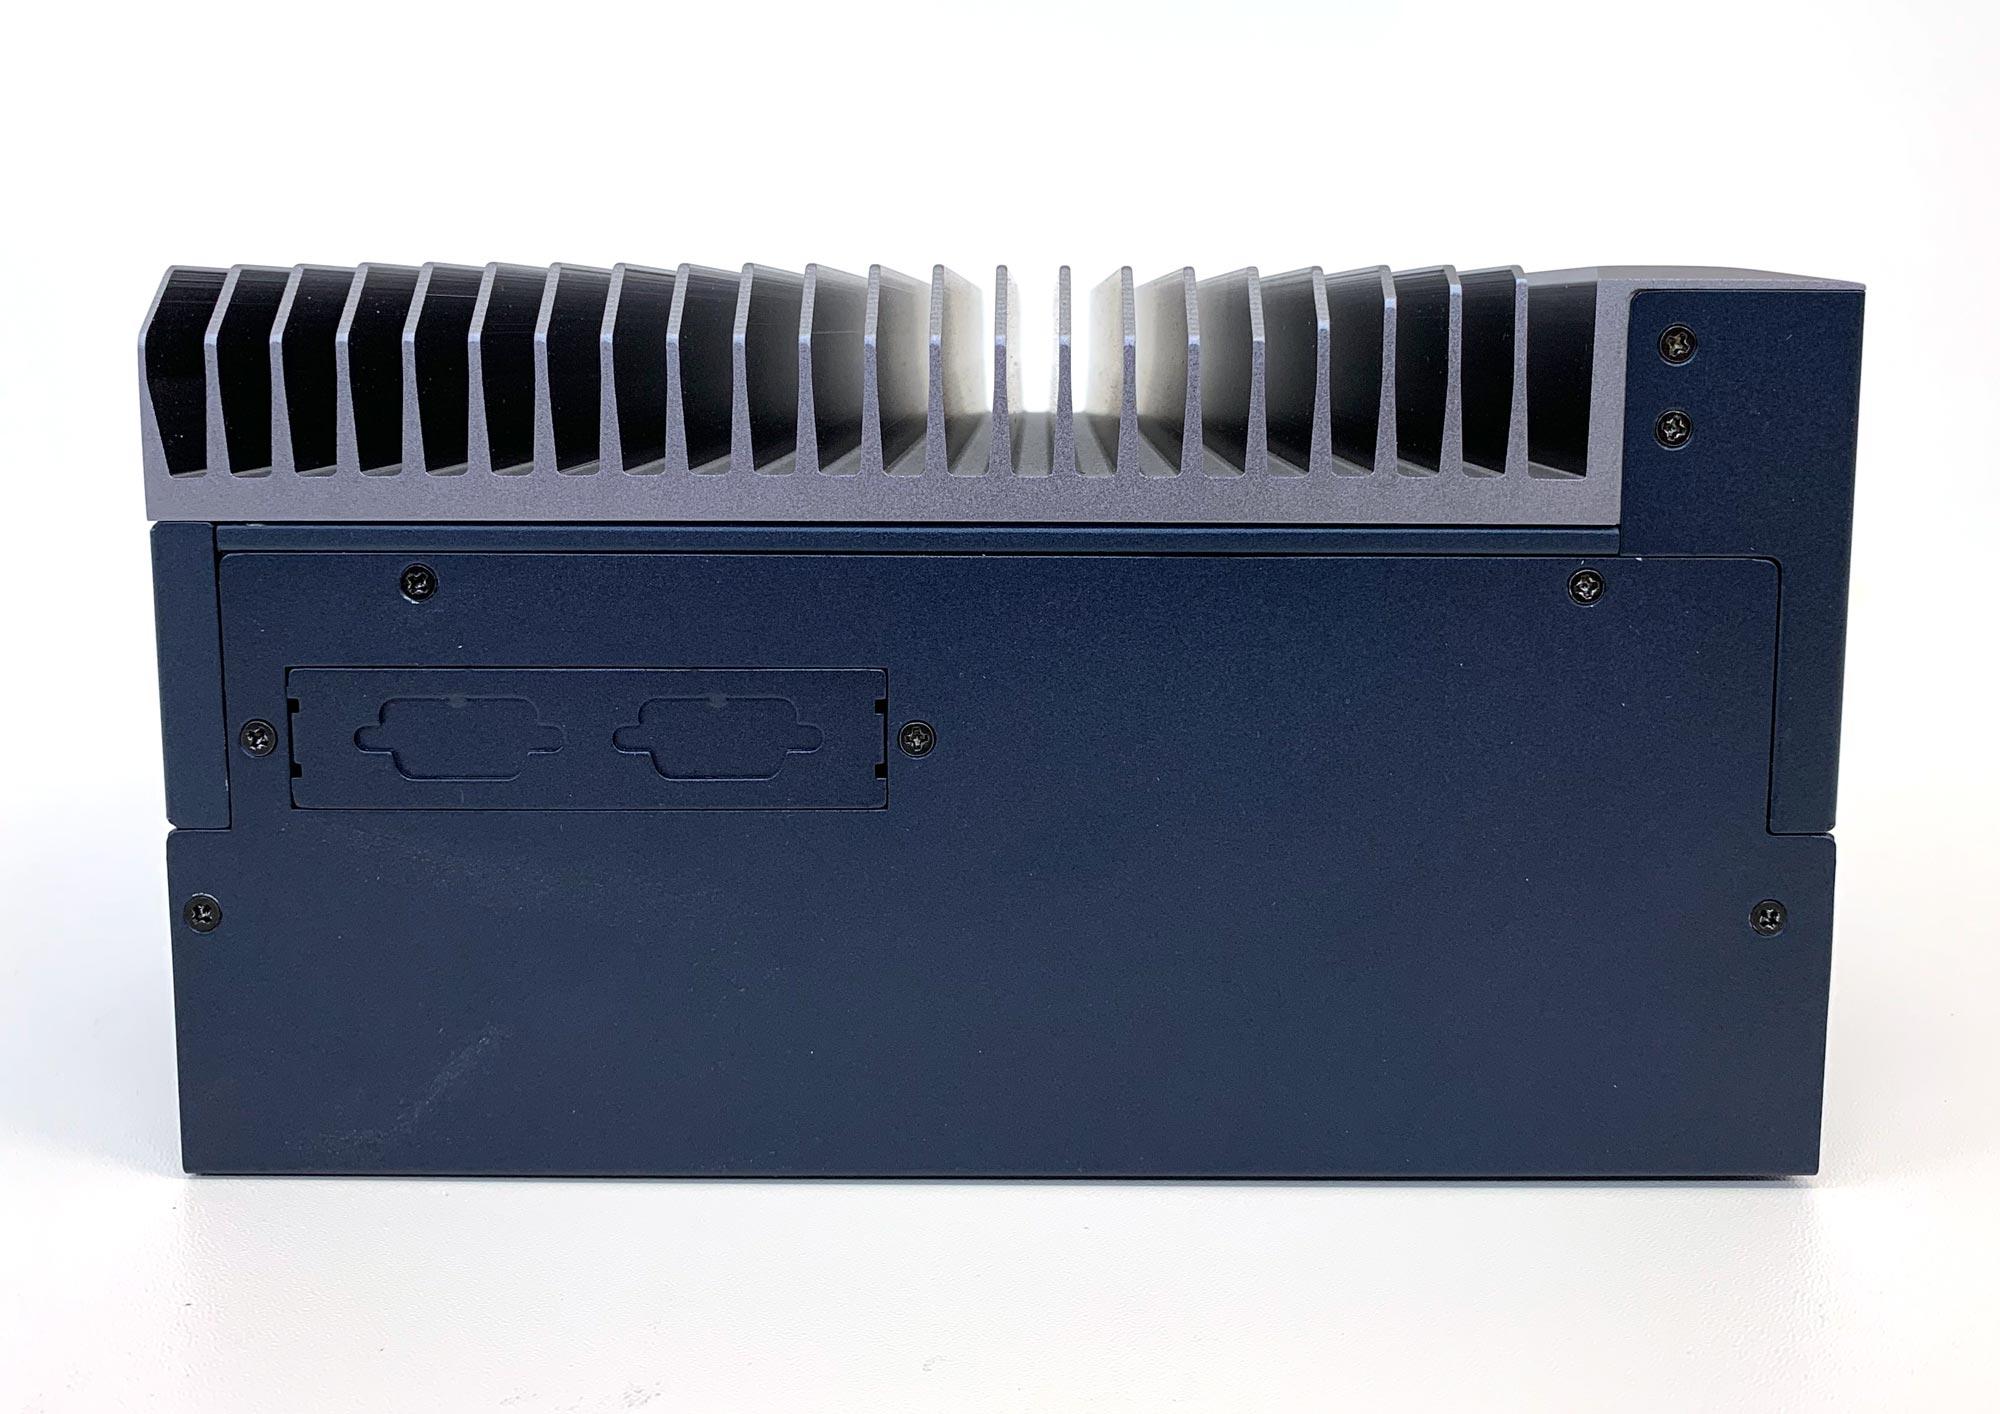 MIC-7700H - Kompaktsystem inkl. Erweiterungskit